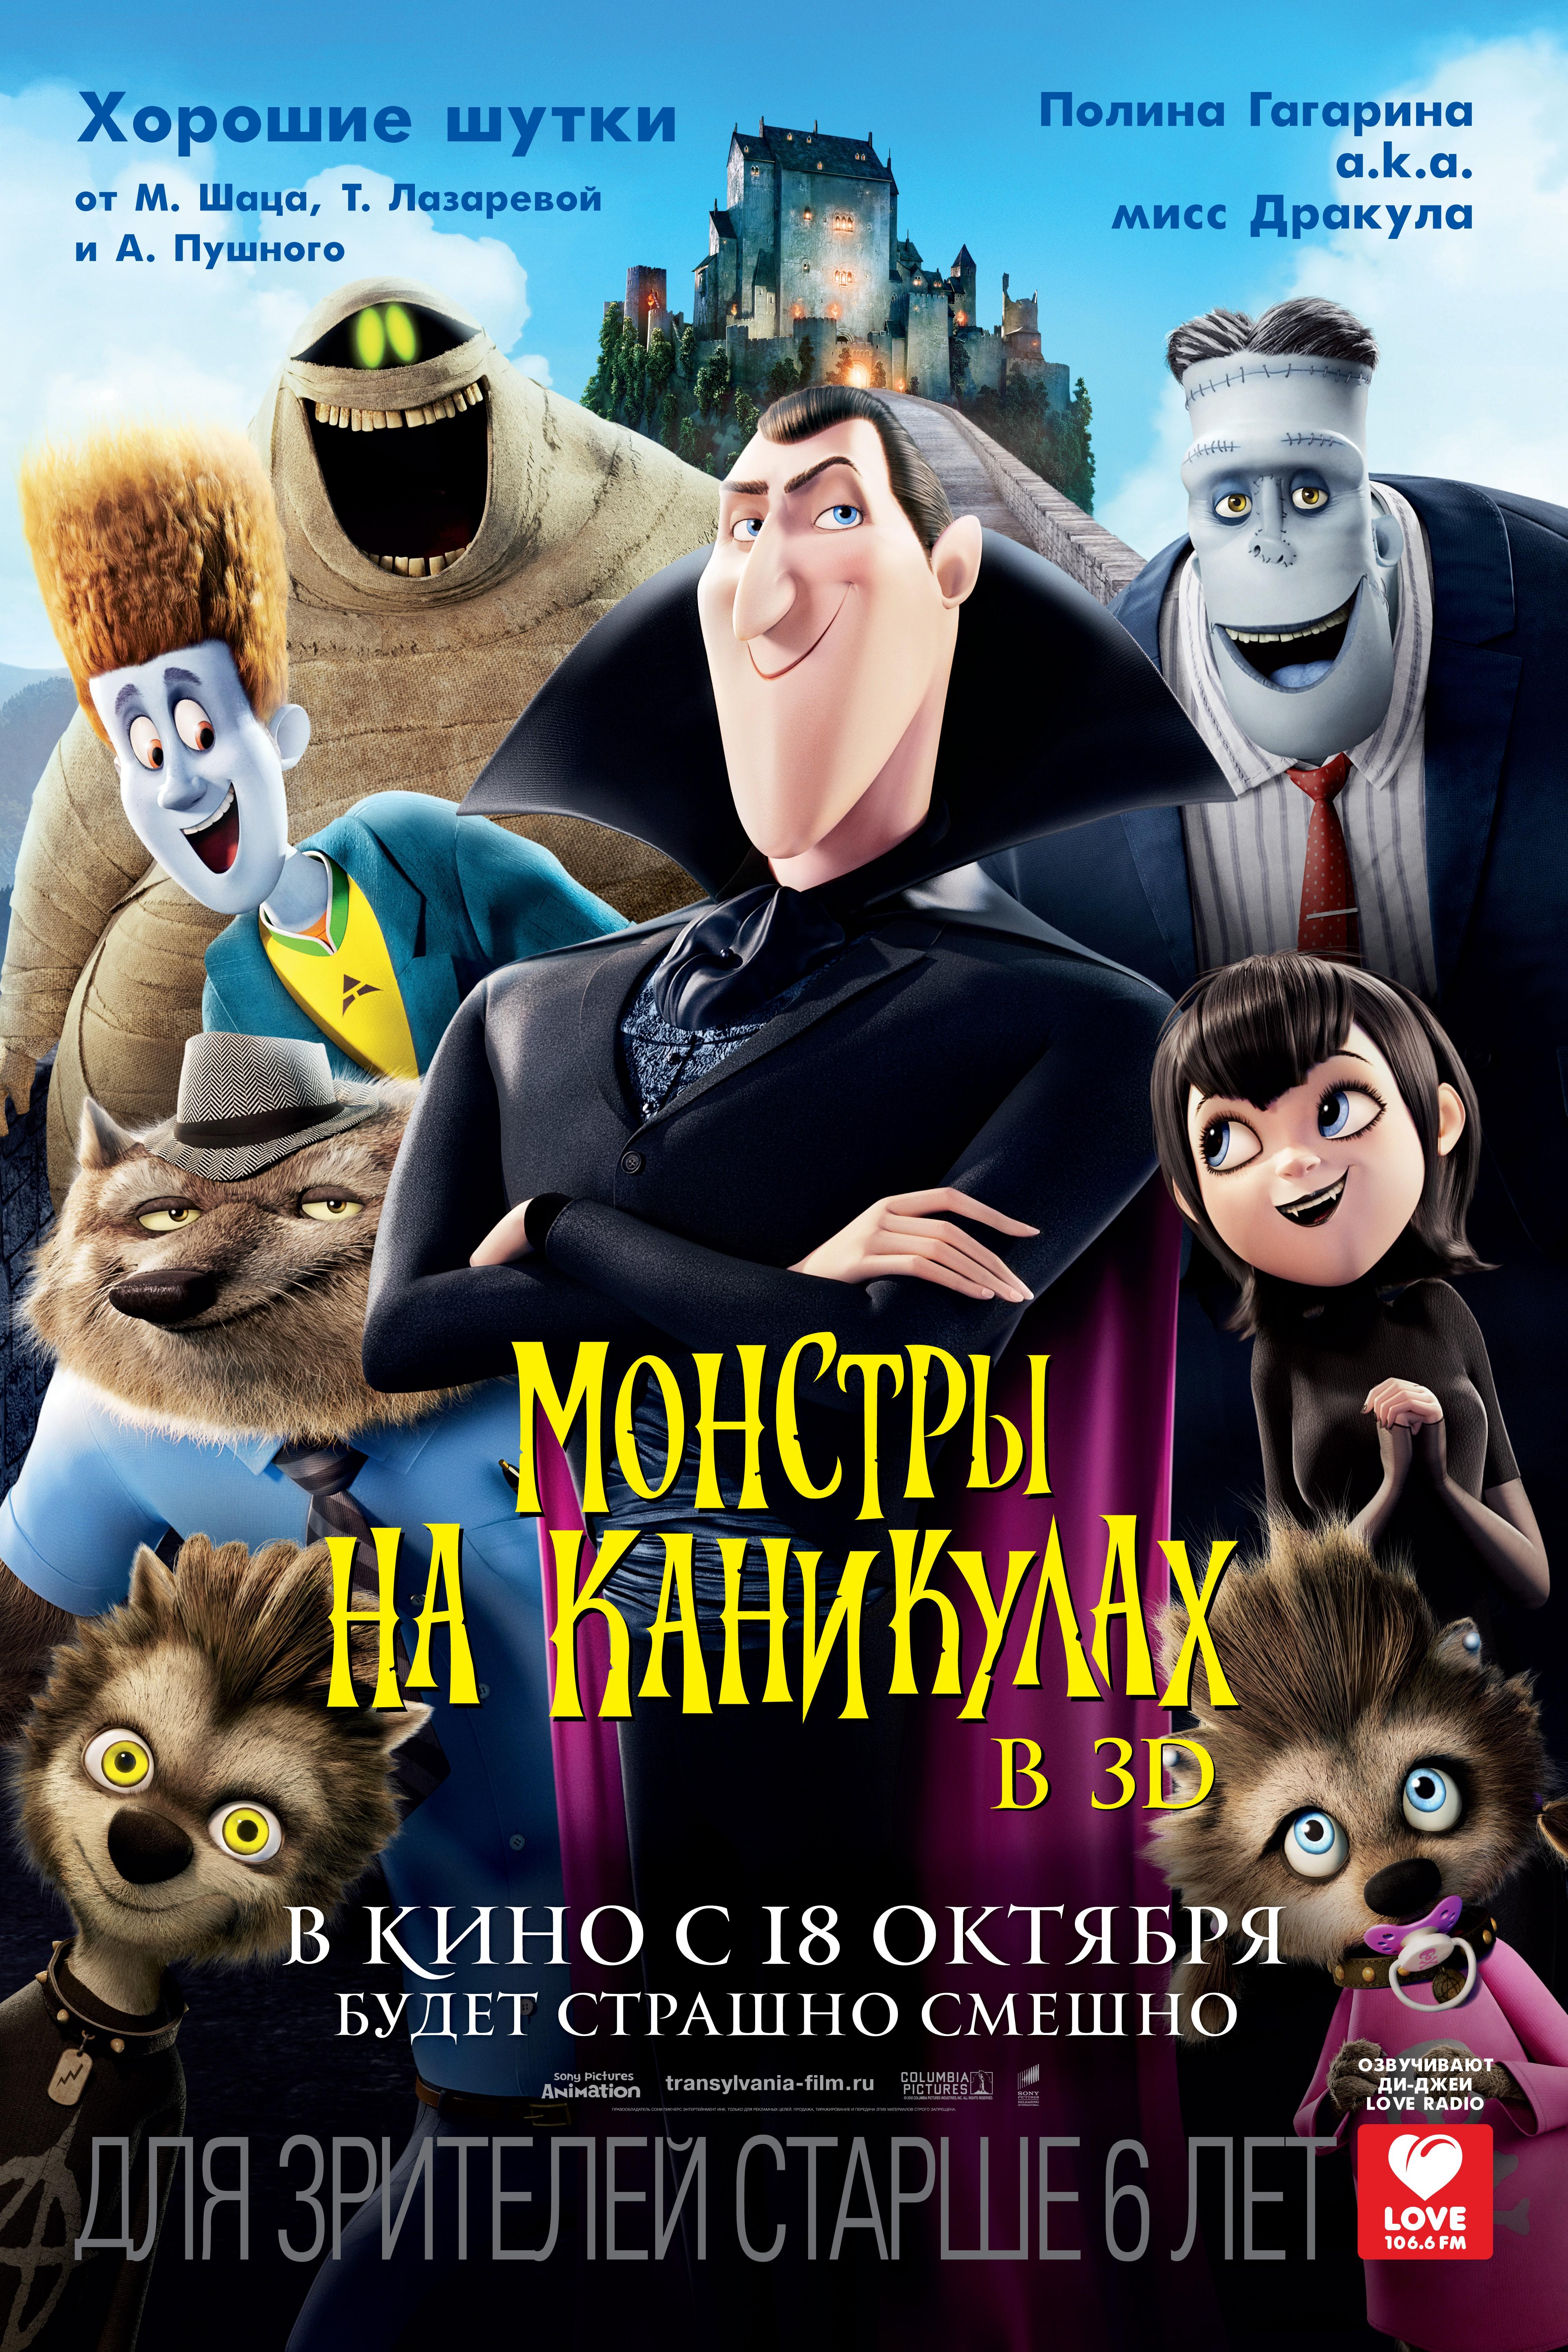 Постер «Монстры на каникулах»